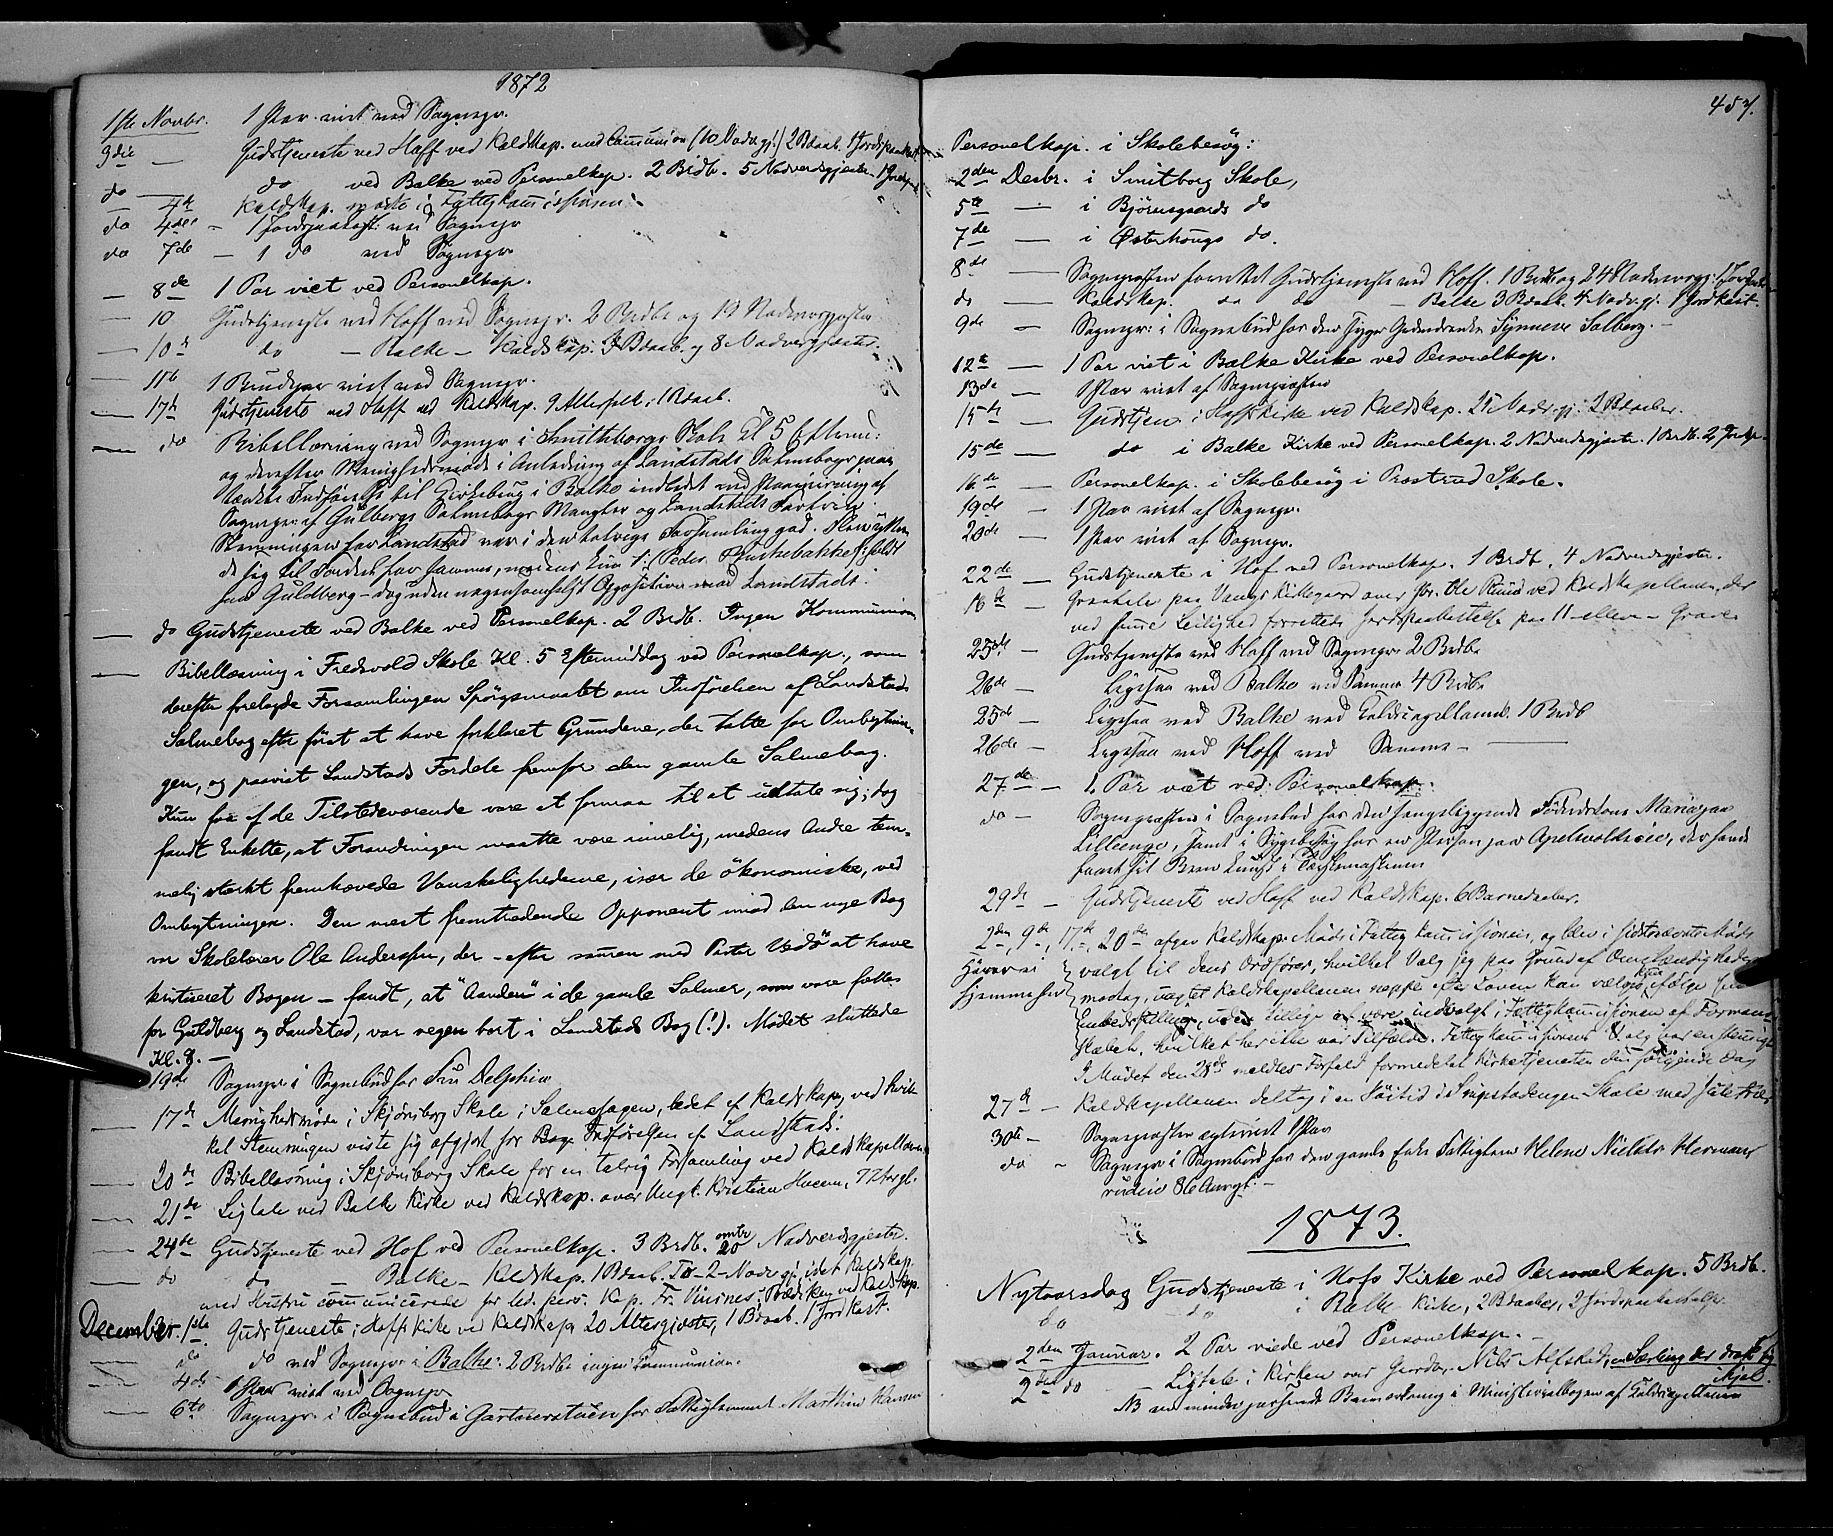 SAH, Østre Toten prestekontor, Ministerialbok nr. 5, 1866-1877, s. 457